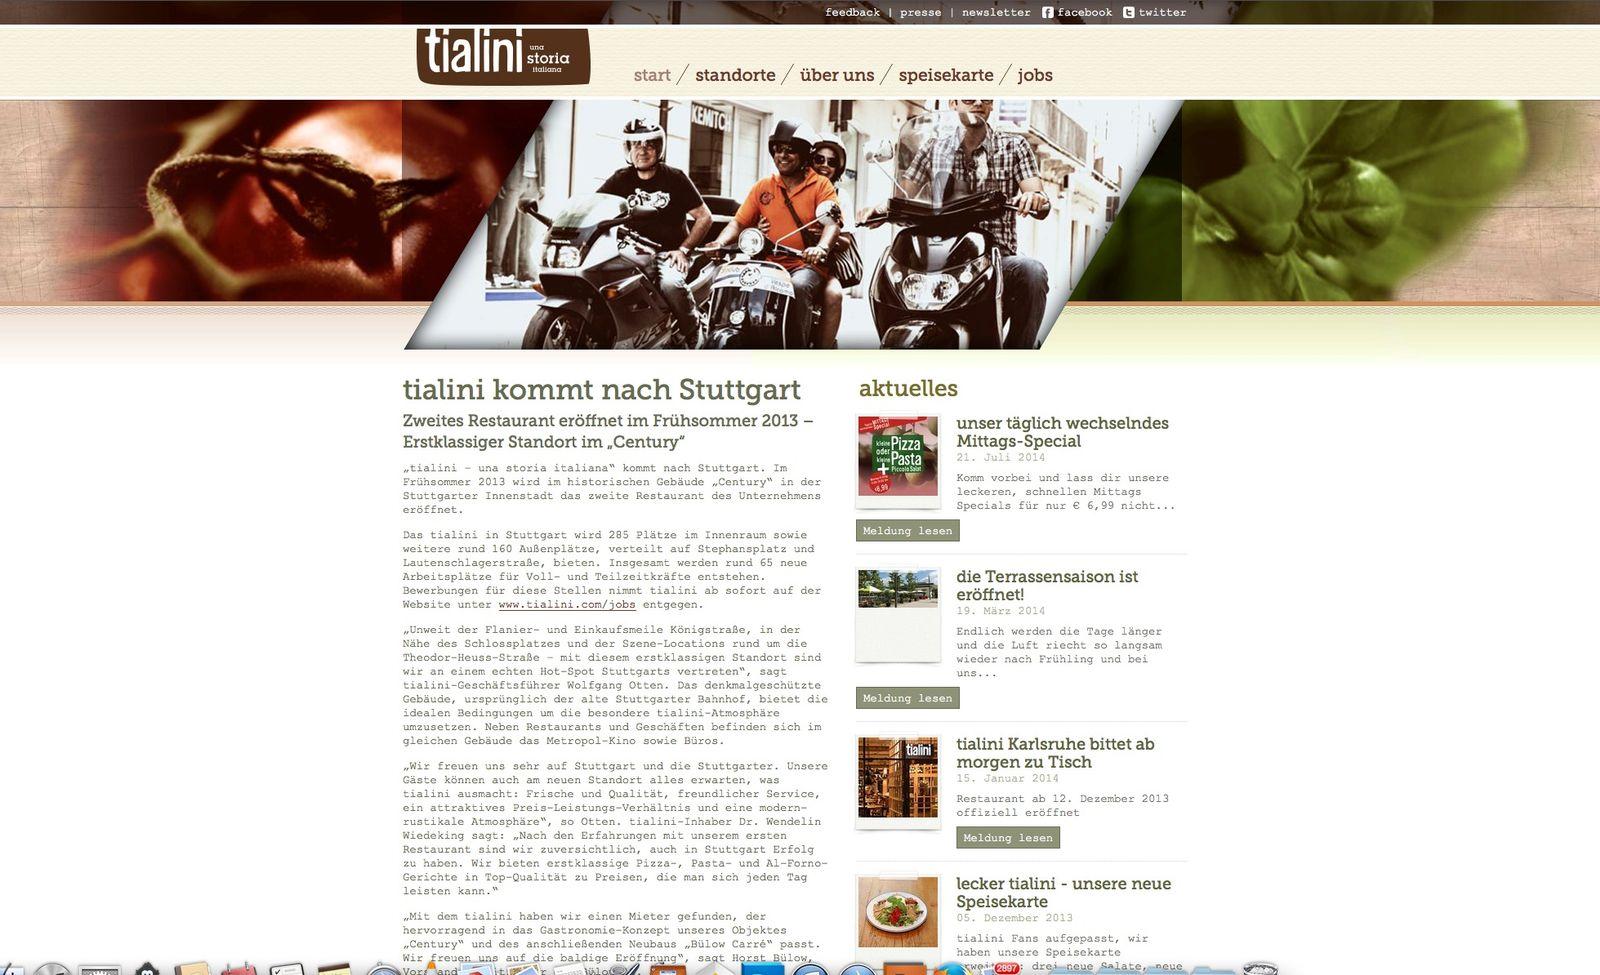 EINMALIGE VERWENDUNG Tialini - una storia italiana / Screenshot